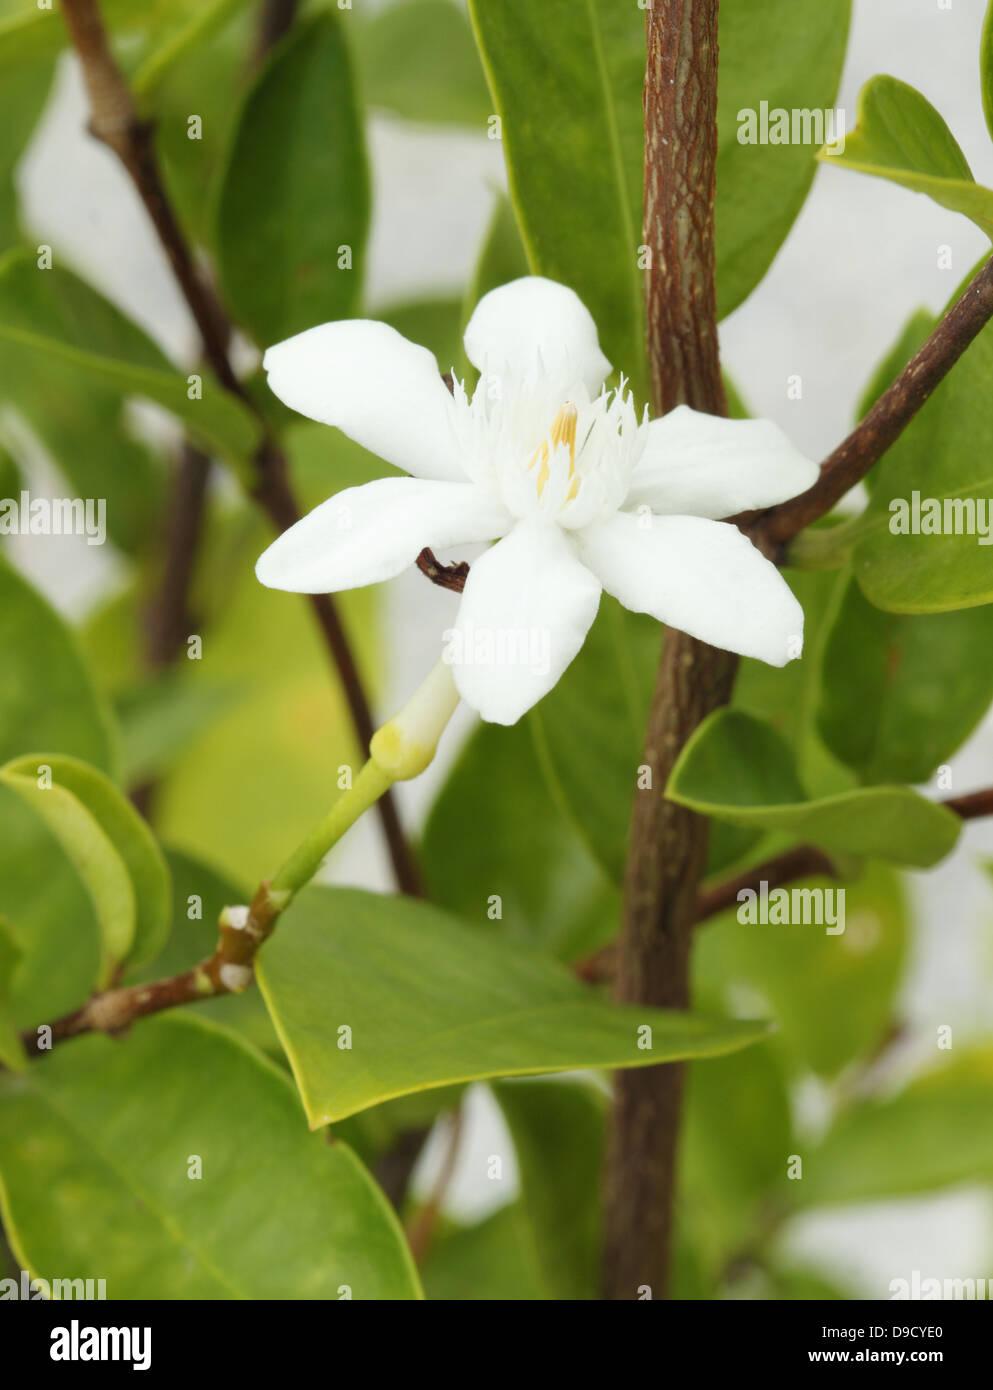 Jasmine creeper white flowers growing stock photos jasmine creeper stephan otis flower in garden stock image mightylinksfo